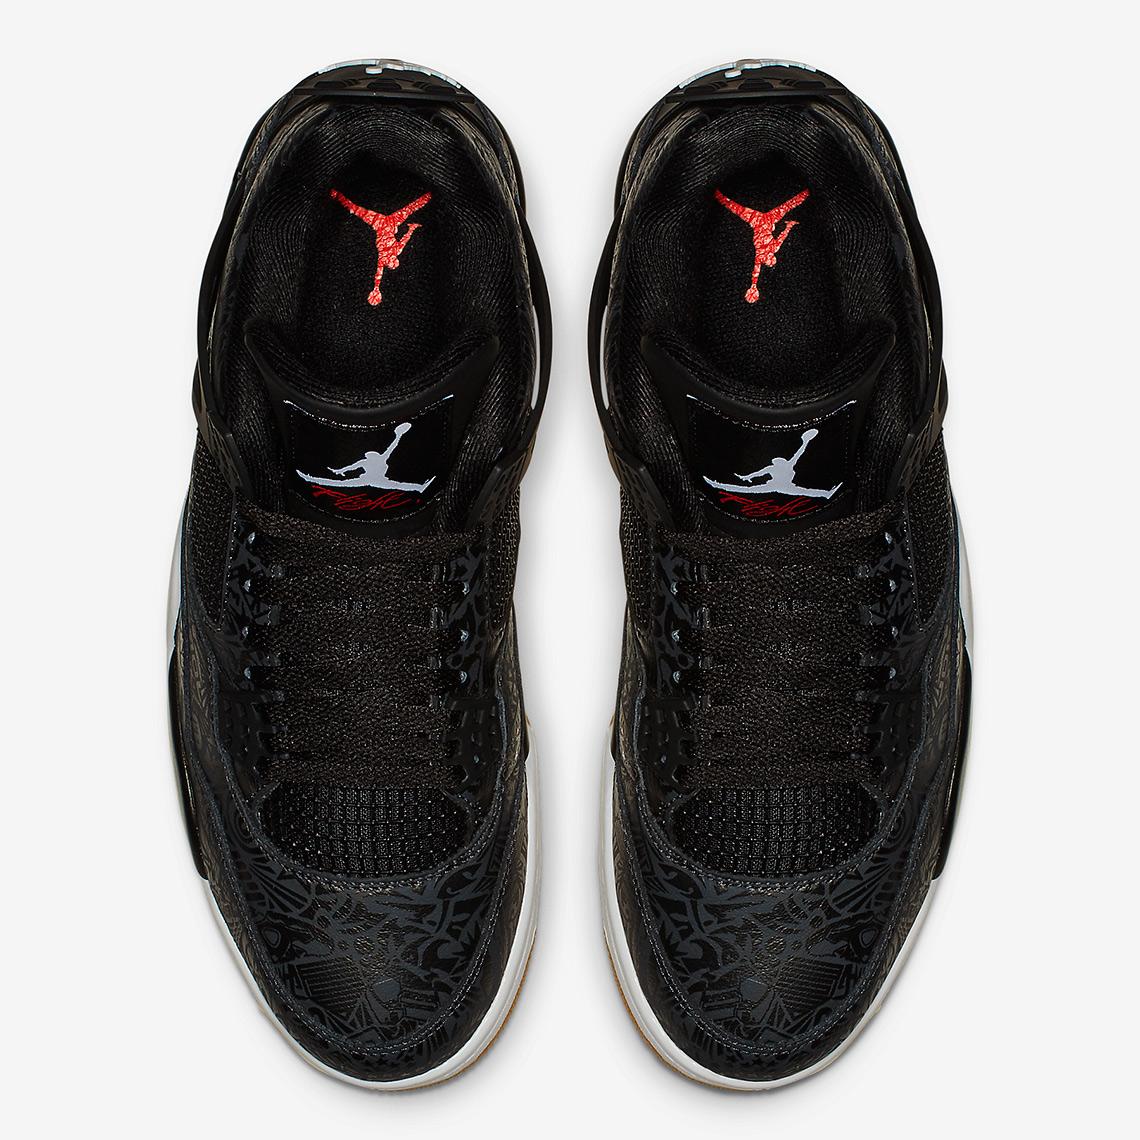 36e234797fd1 Air Jordan 4 Black Laser CI1184-001 Release Info